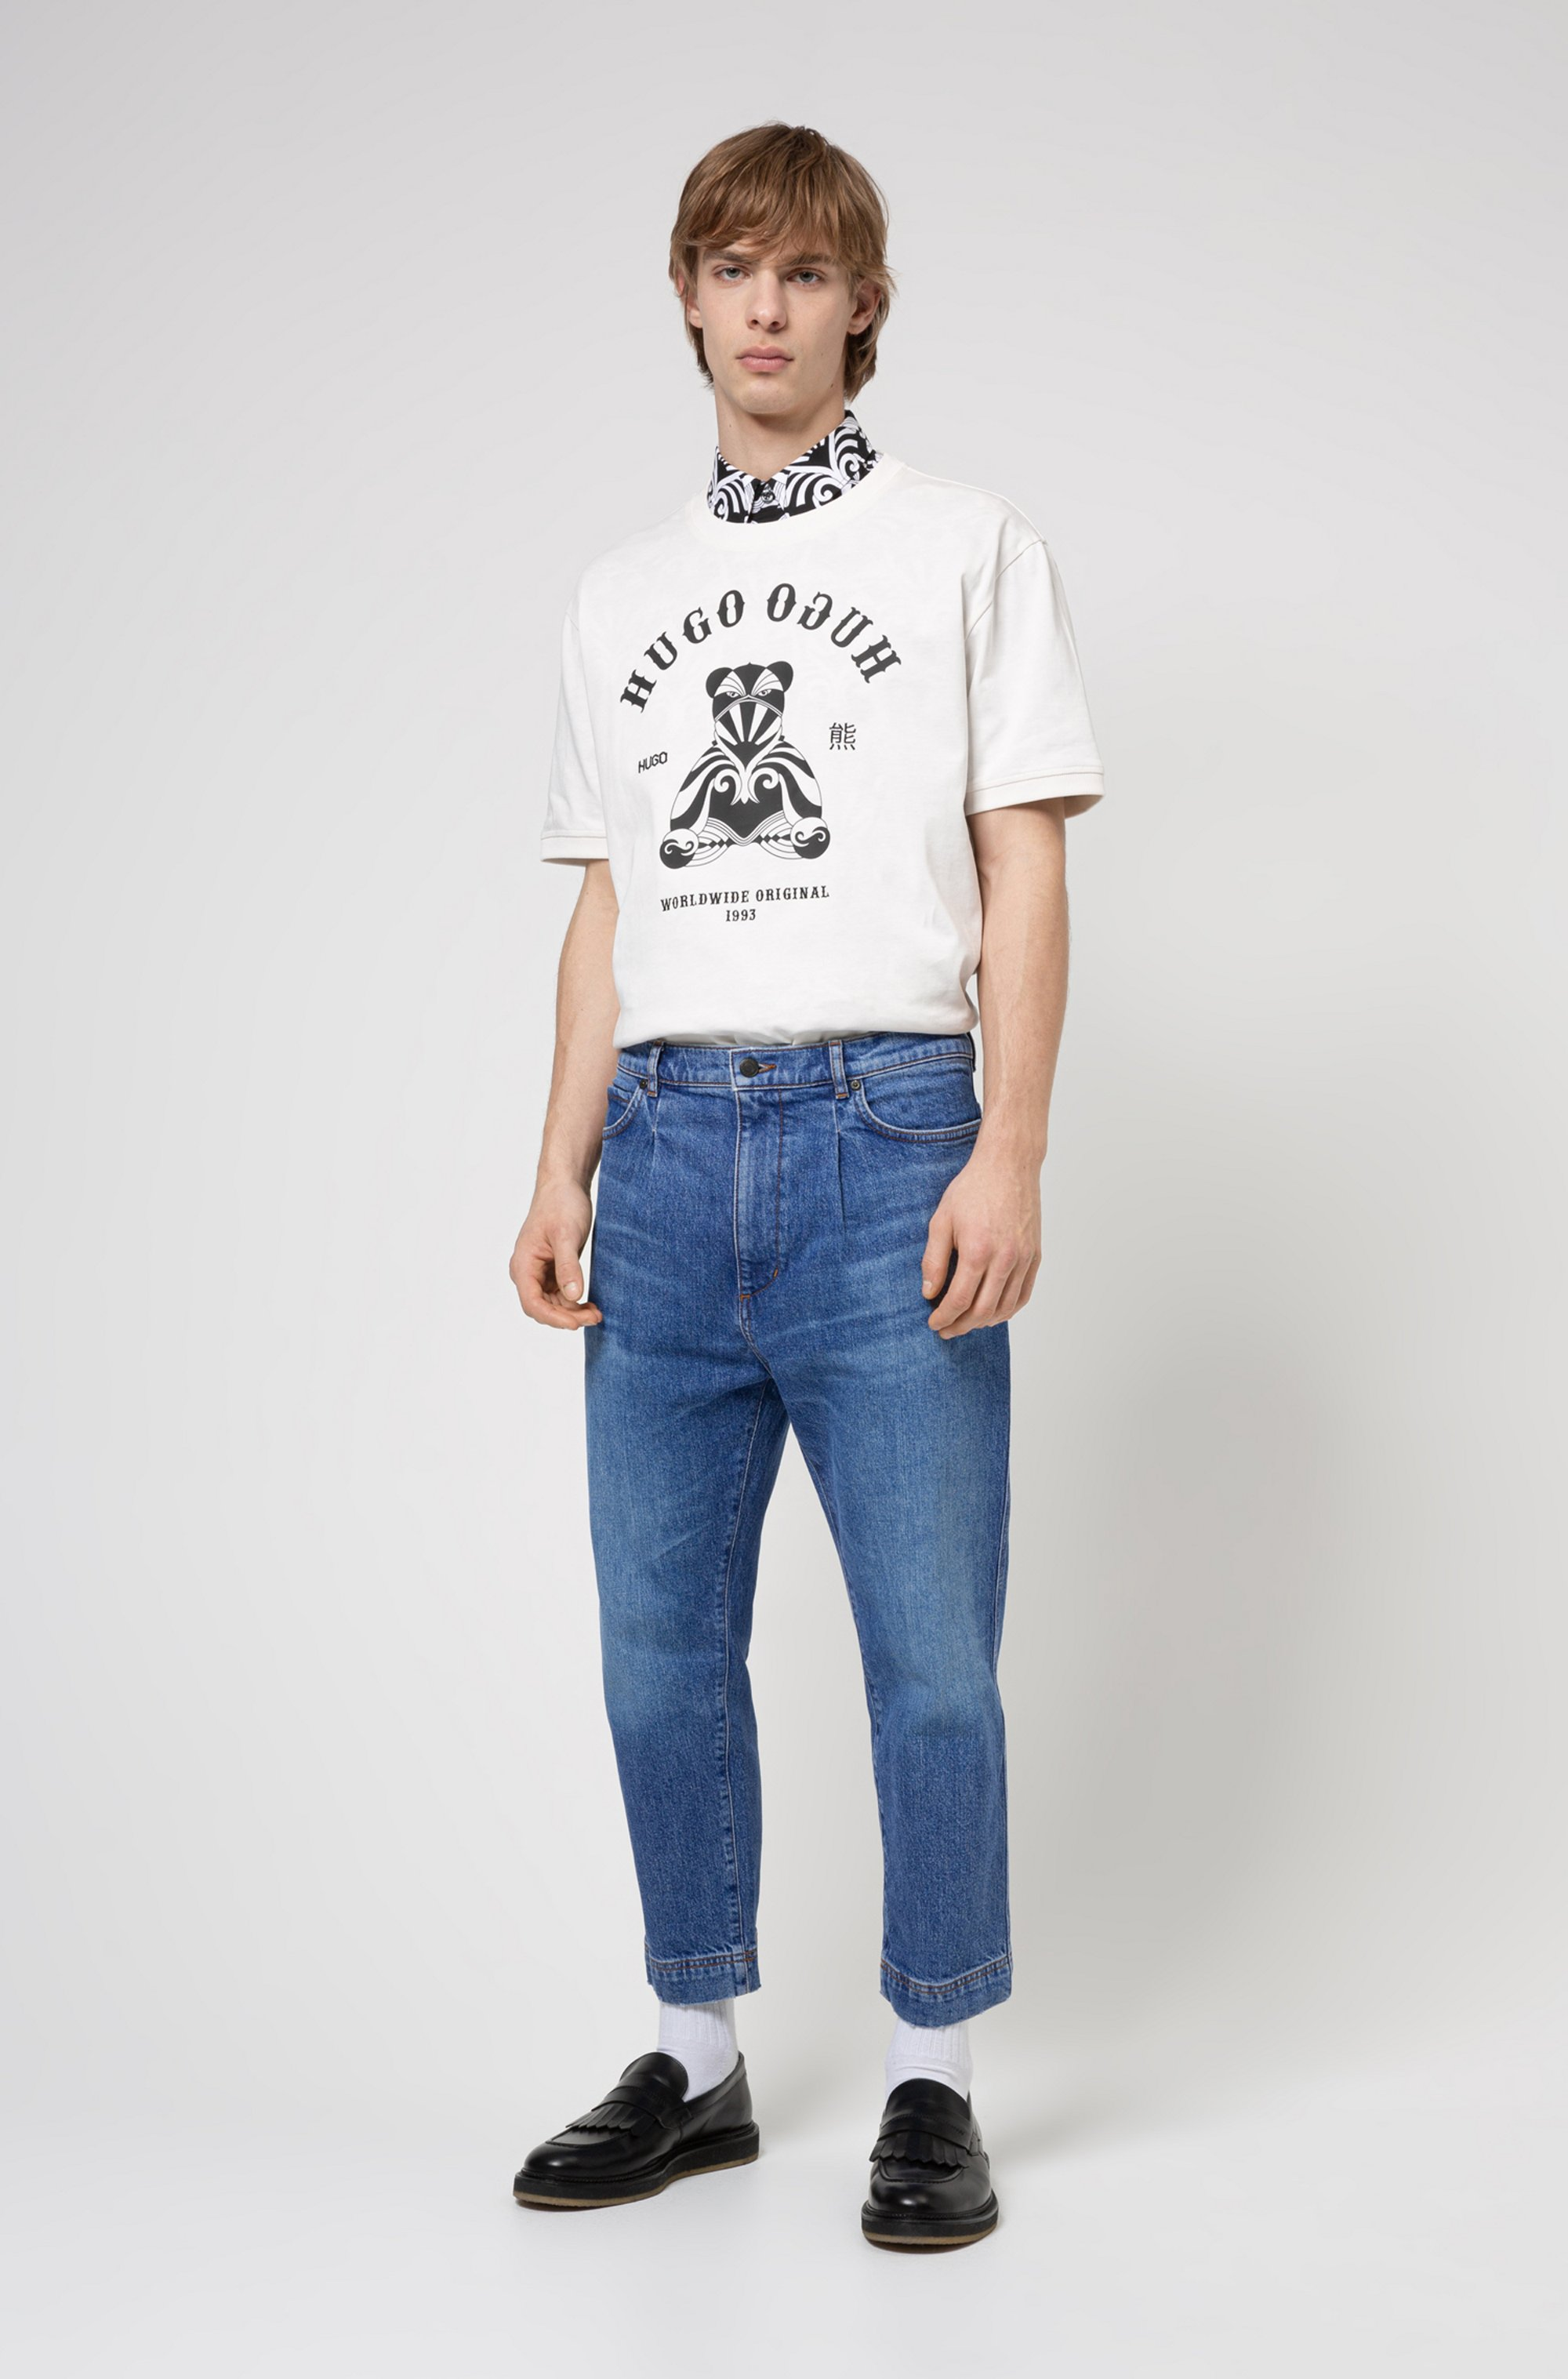 Regular-fit cotton T-shirt with bear and logo artwork